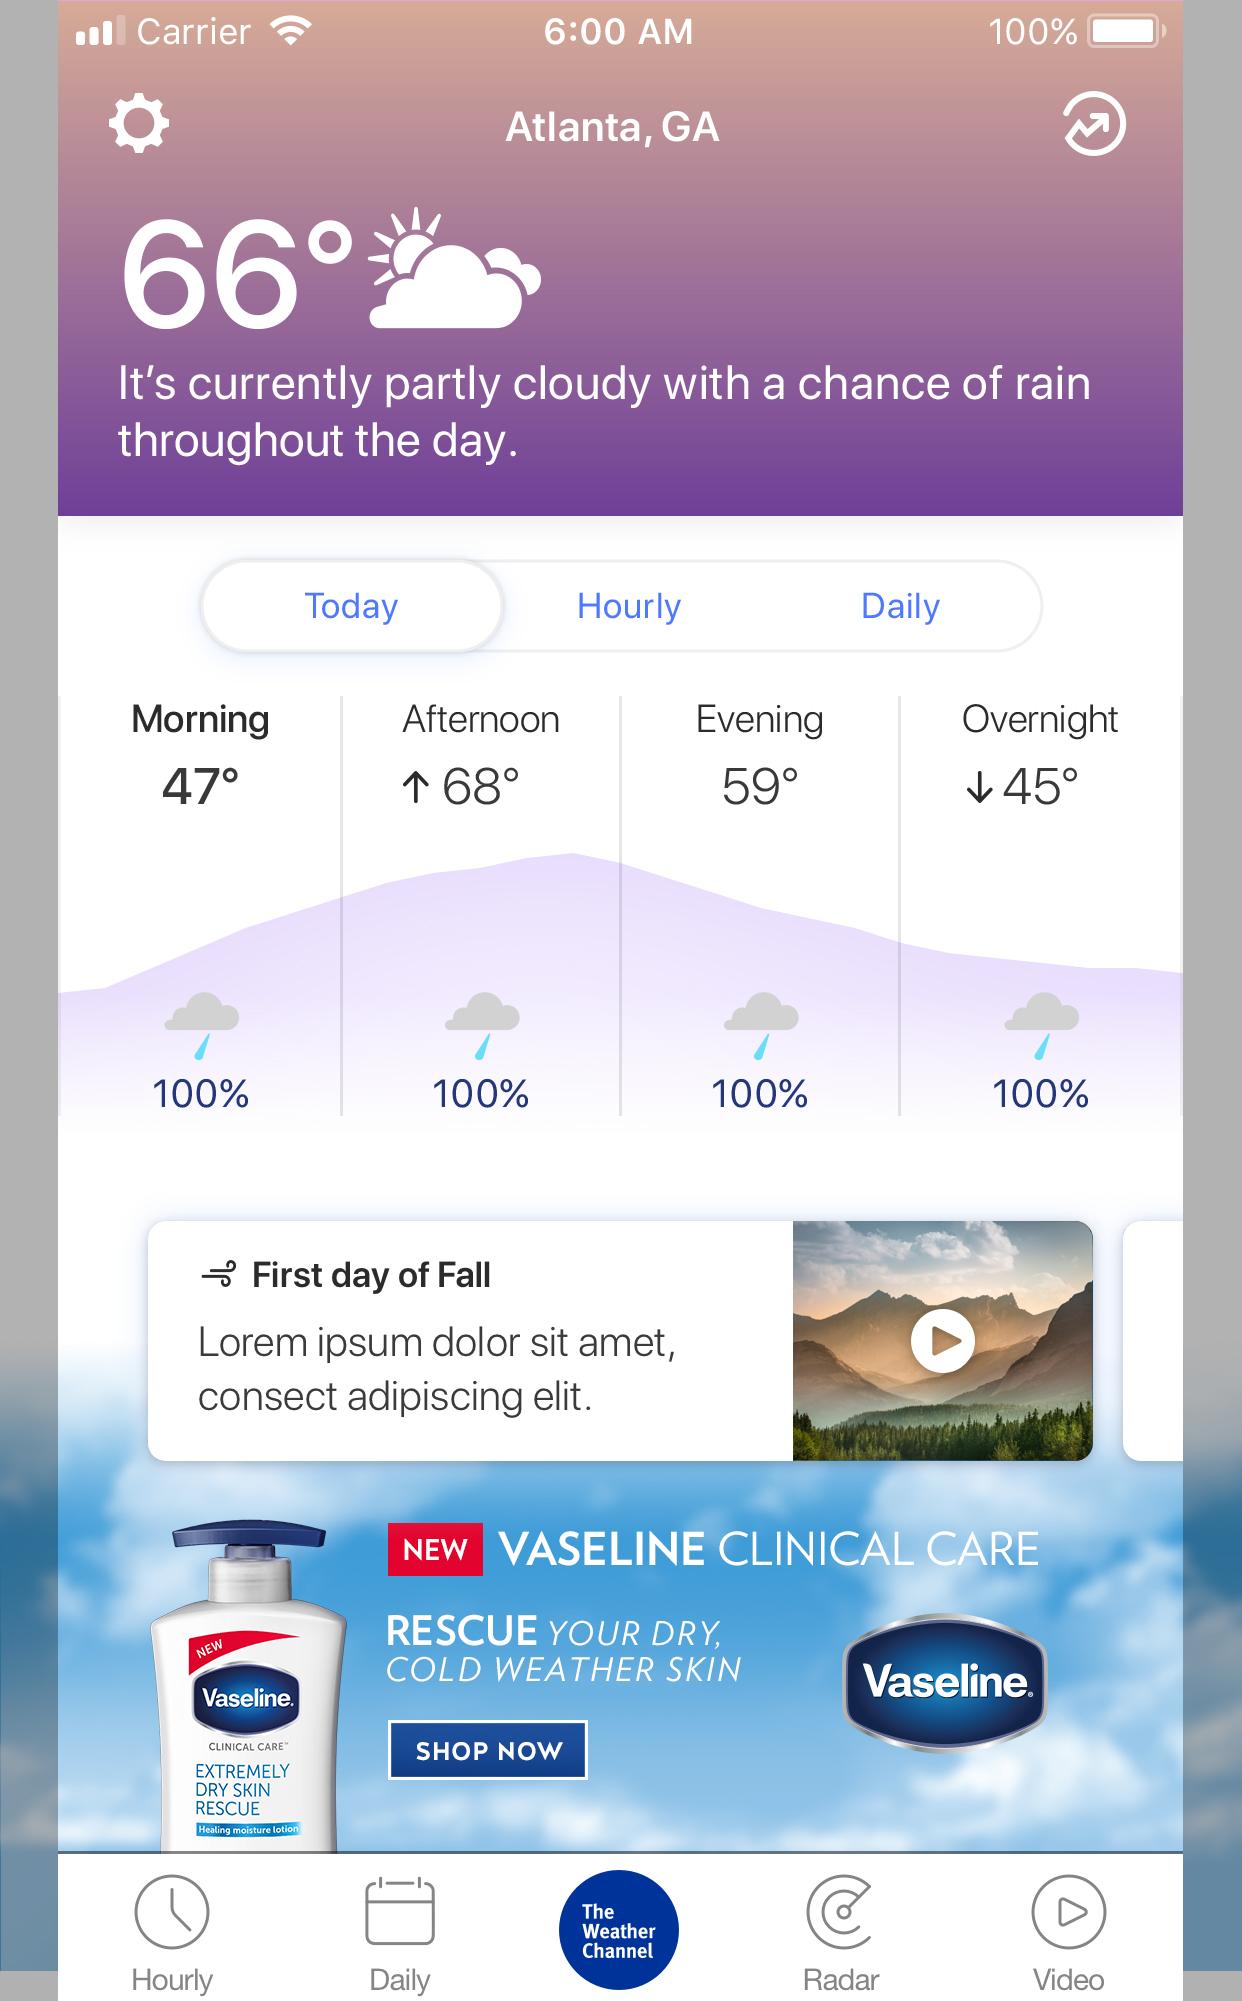 Vaseline_IM_0002_Cloudy Day